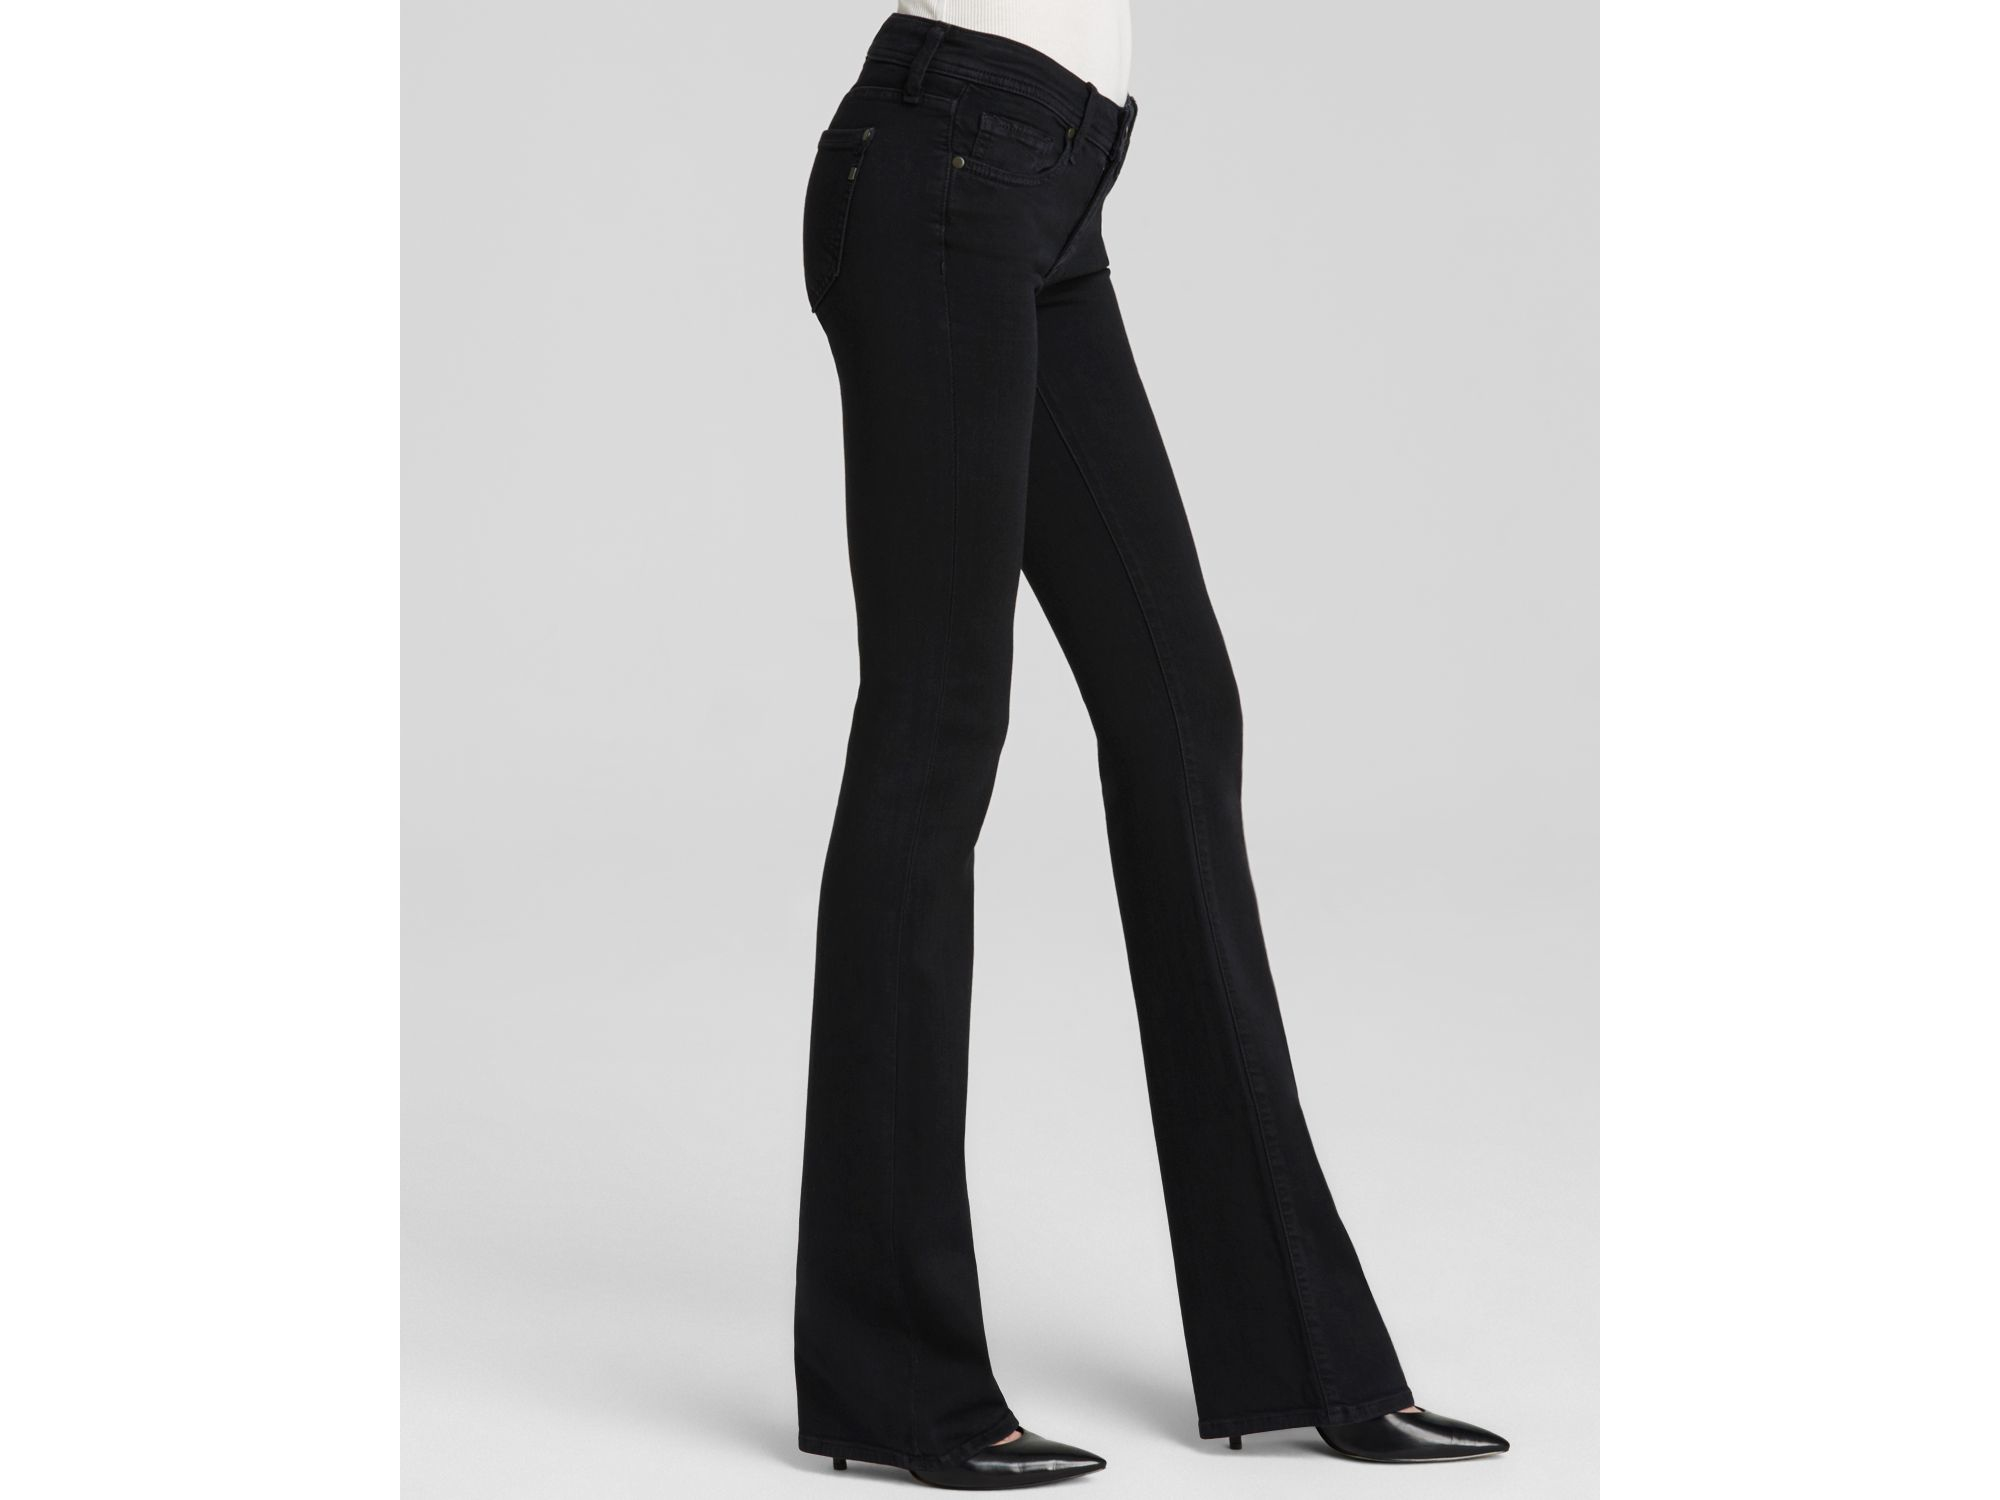 Genetic denim Jeans - The Riley Bootcut In Dark Tin in Black | Lyst